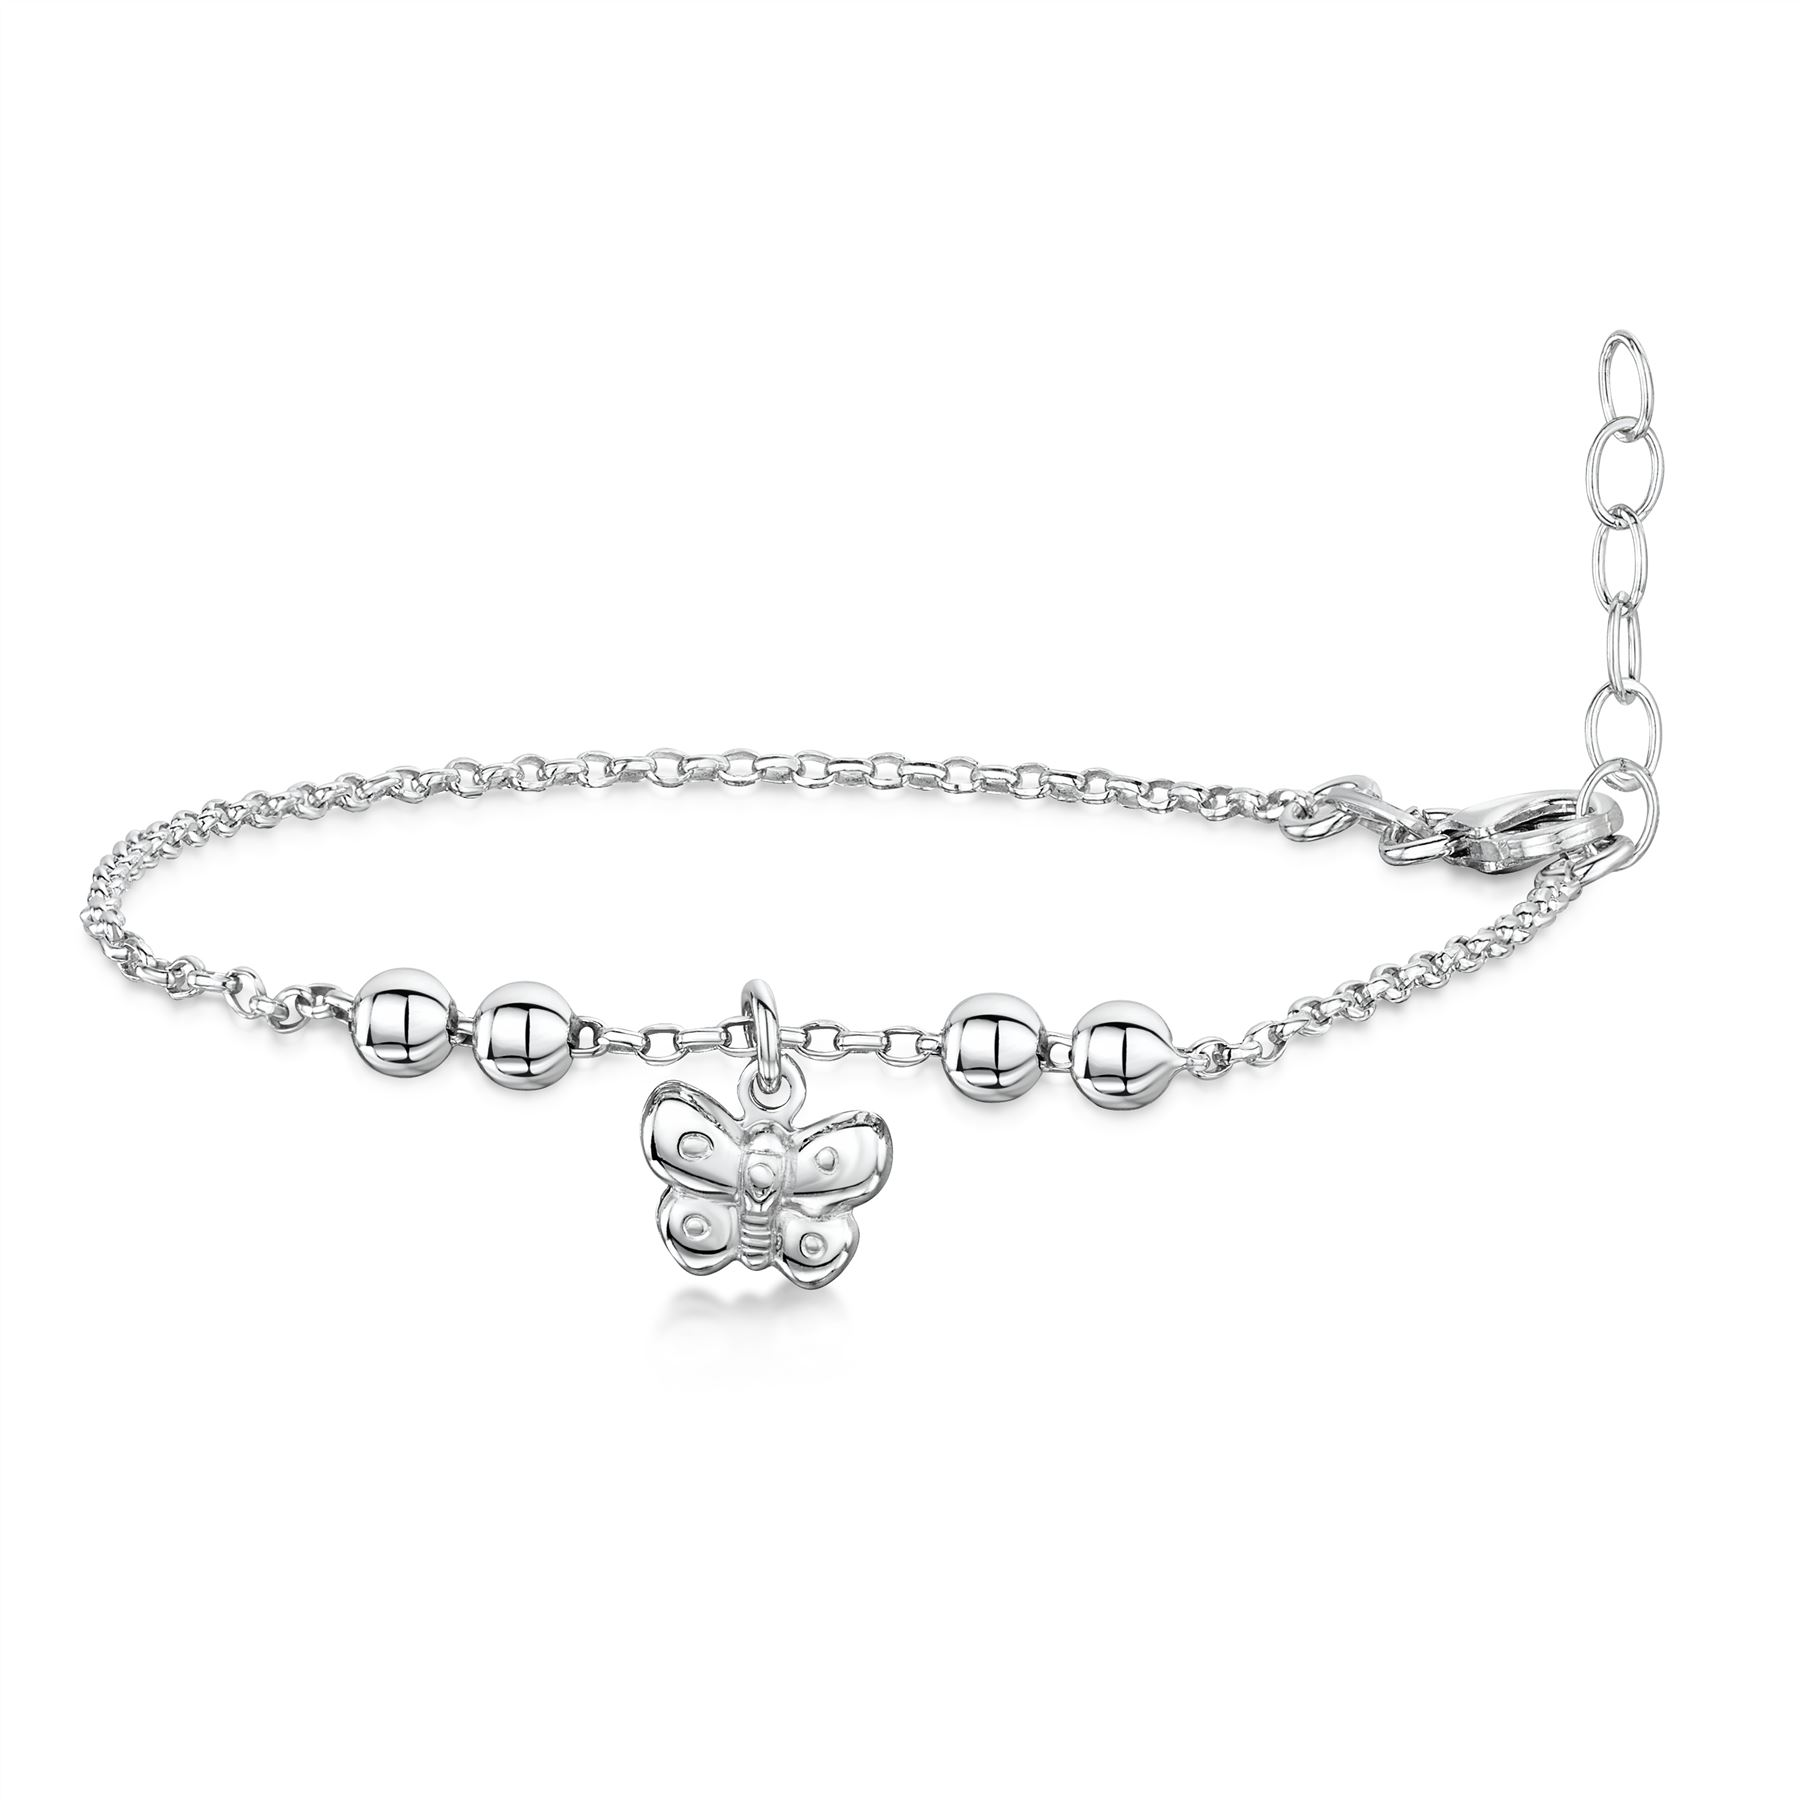 Amberta-Jewelry-925-Sterling-Silver-Adjustable-Bracelet-Italian-Bangle-for-Women miniature 42